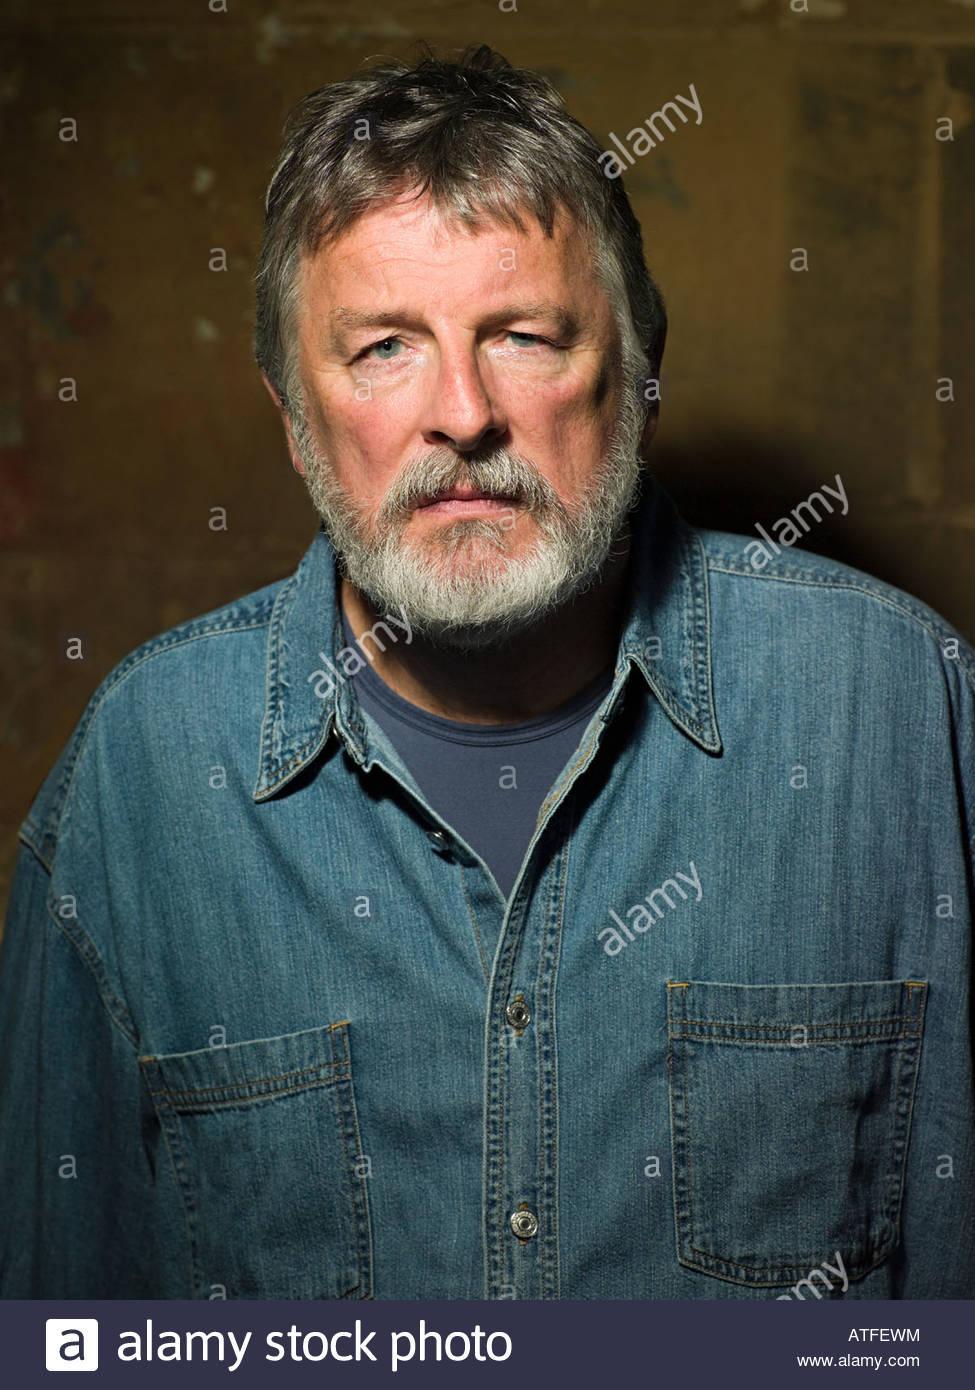 Mature man wearing a denim shirt - Stock Image